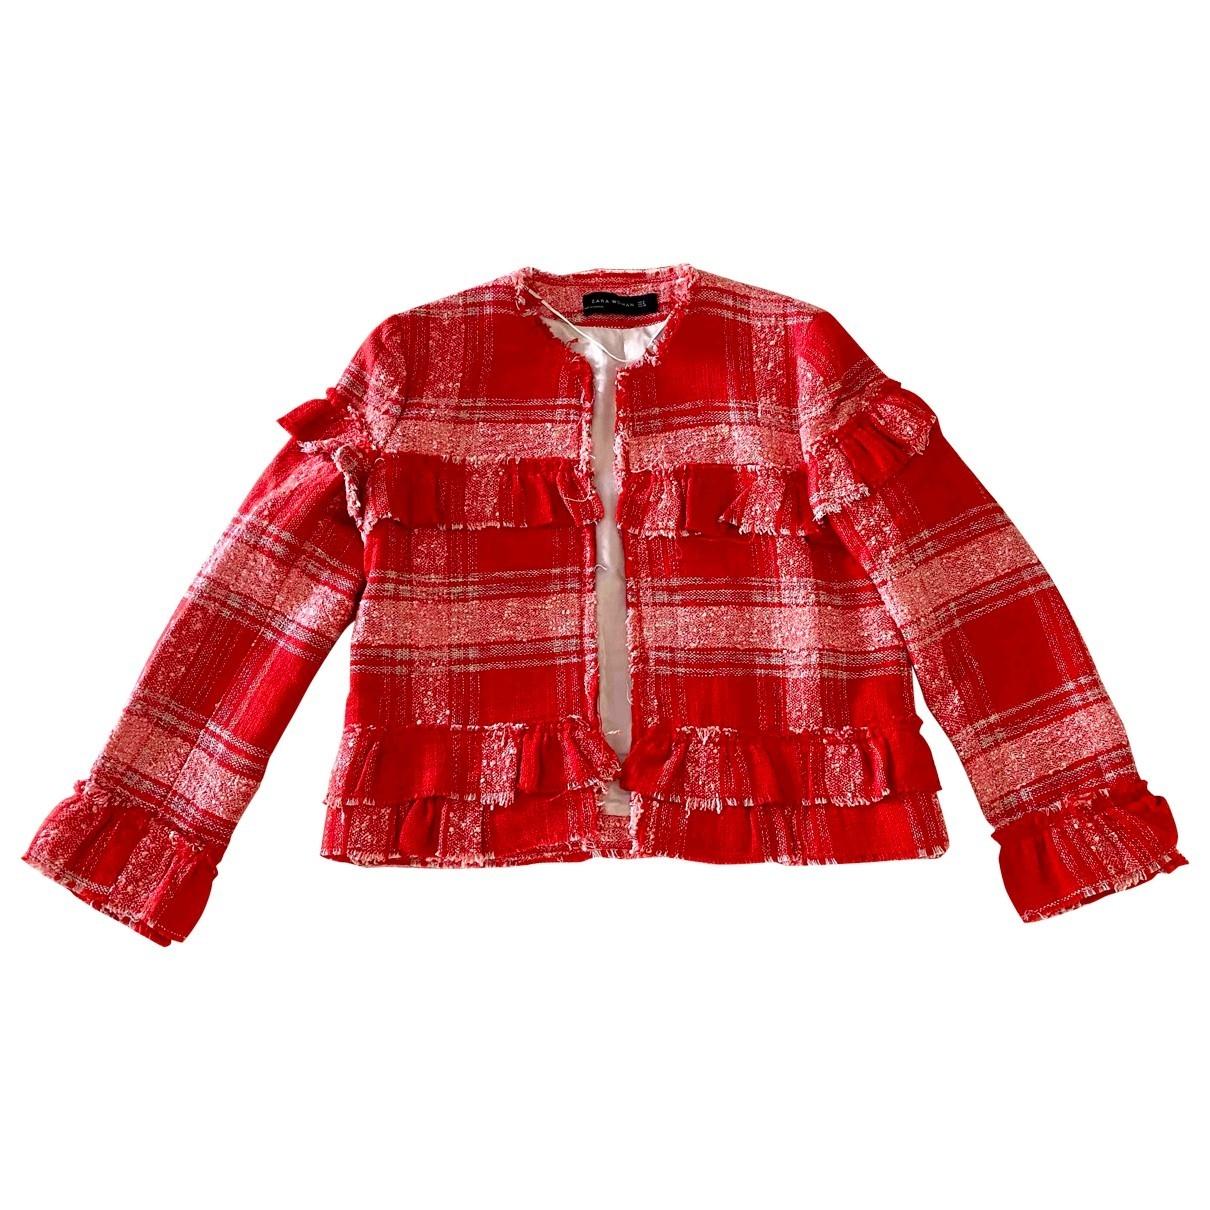 Zara \N Red Cotton jacket for Women S International